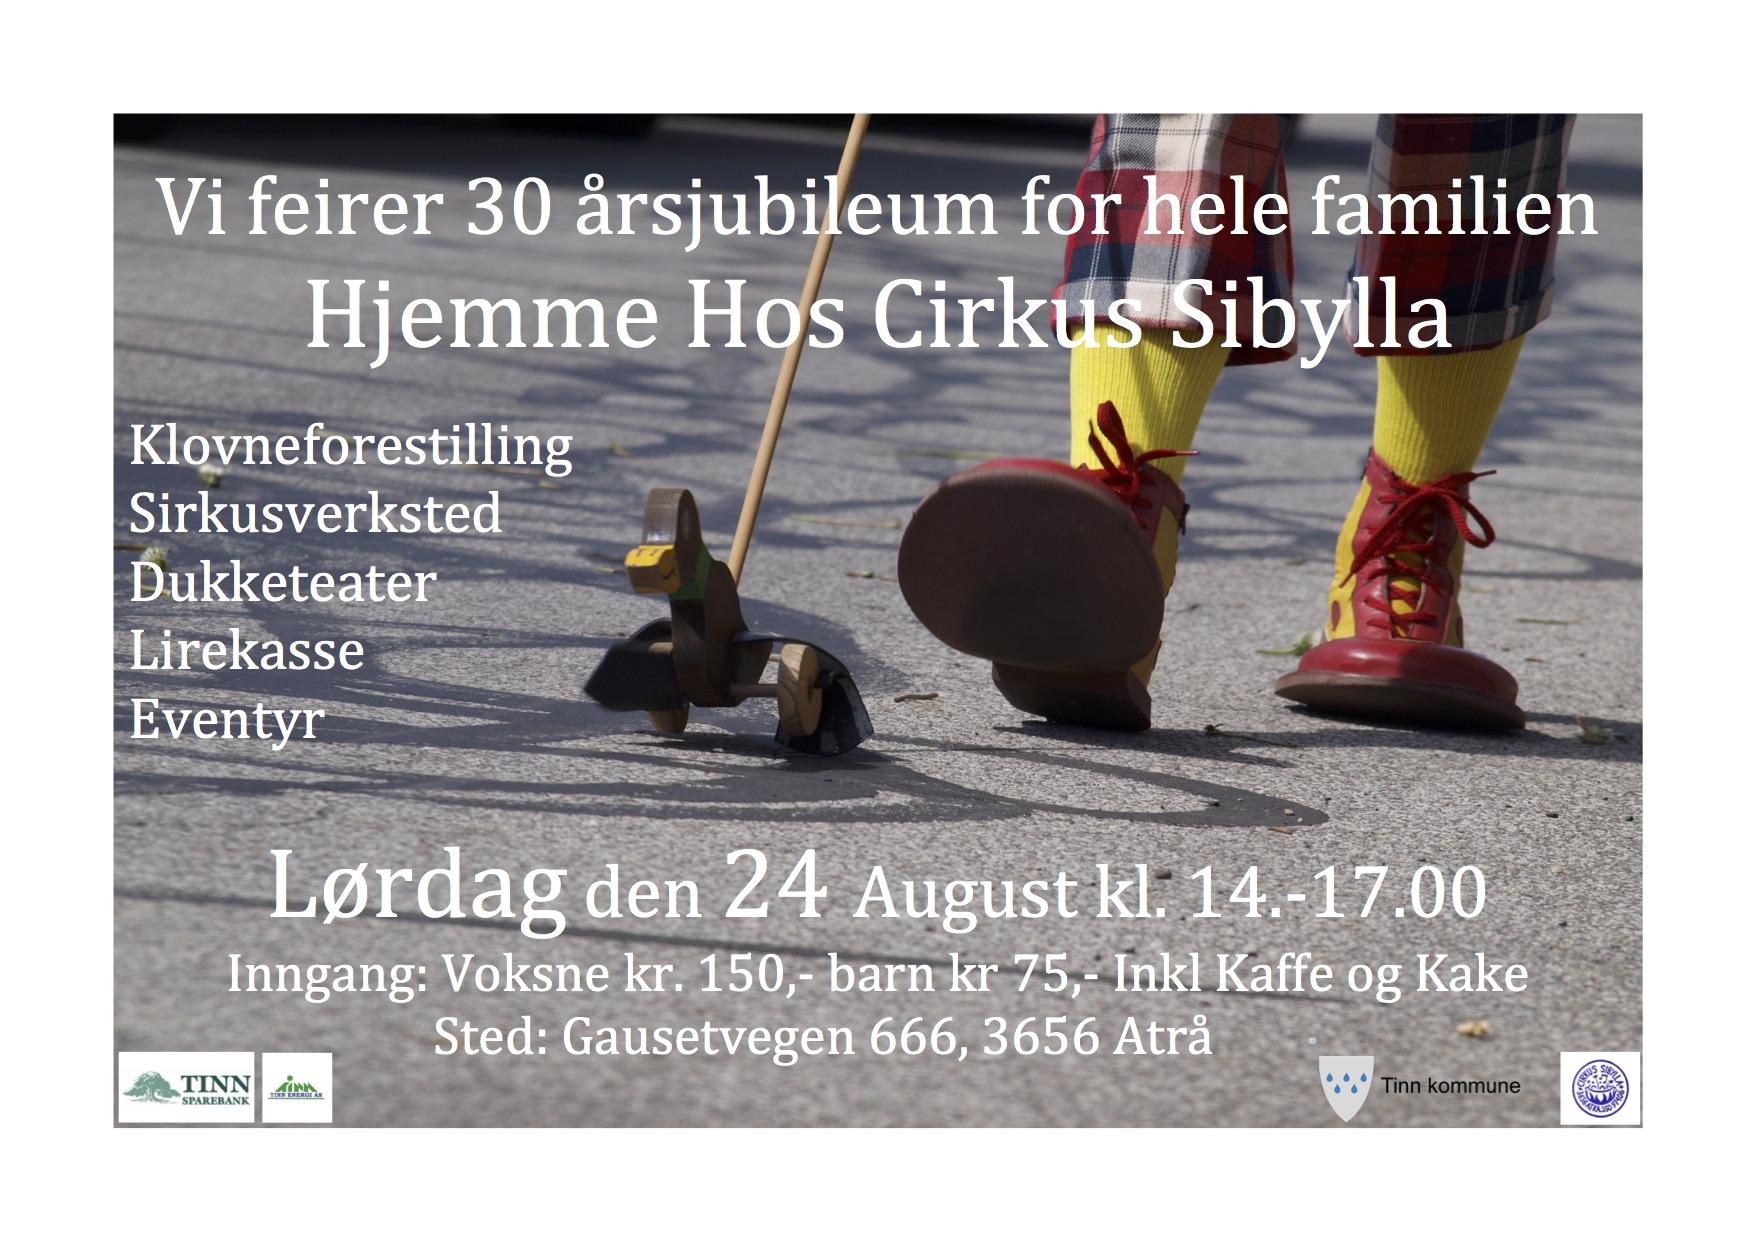 Plakat Cirkus Sibylla 30 års jubileum